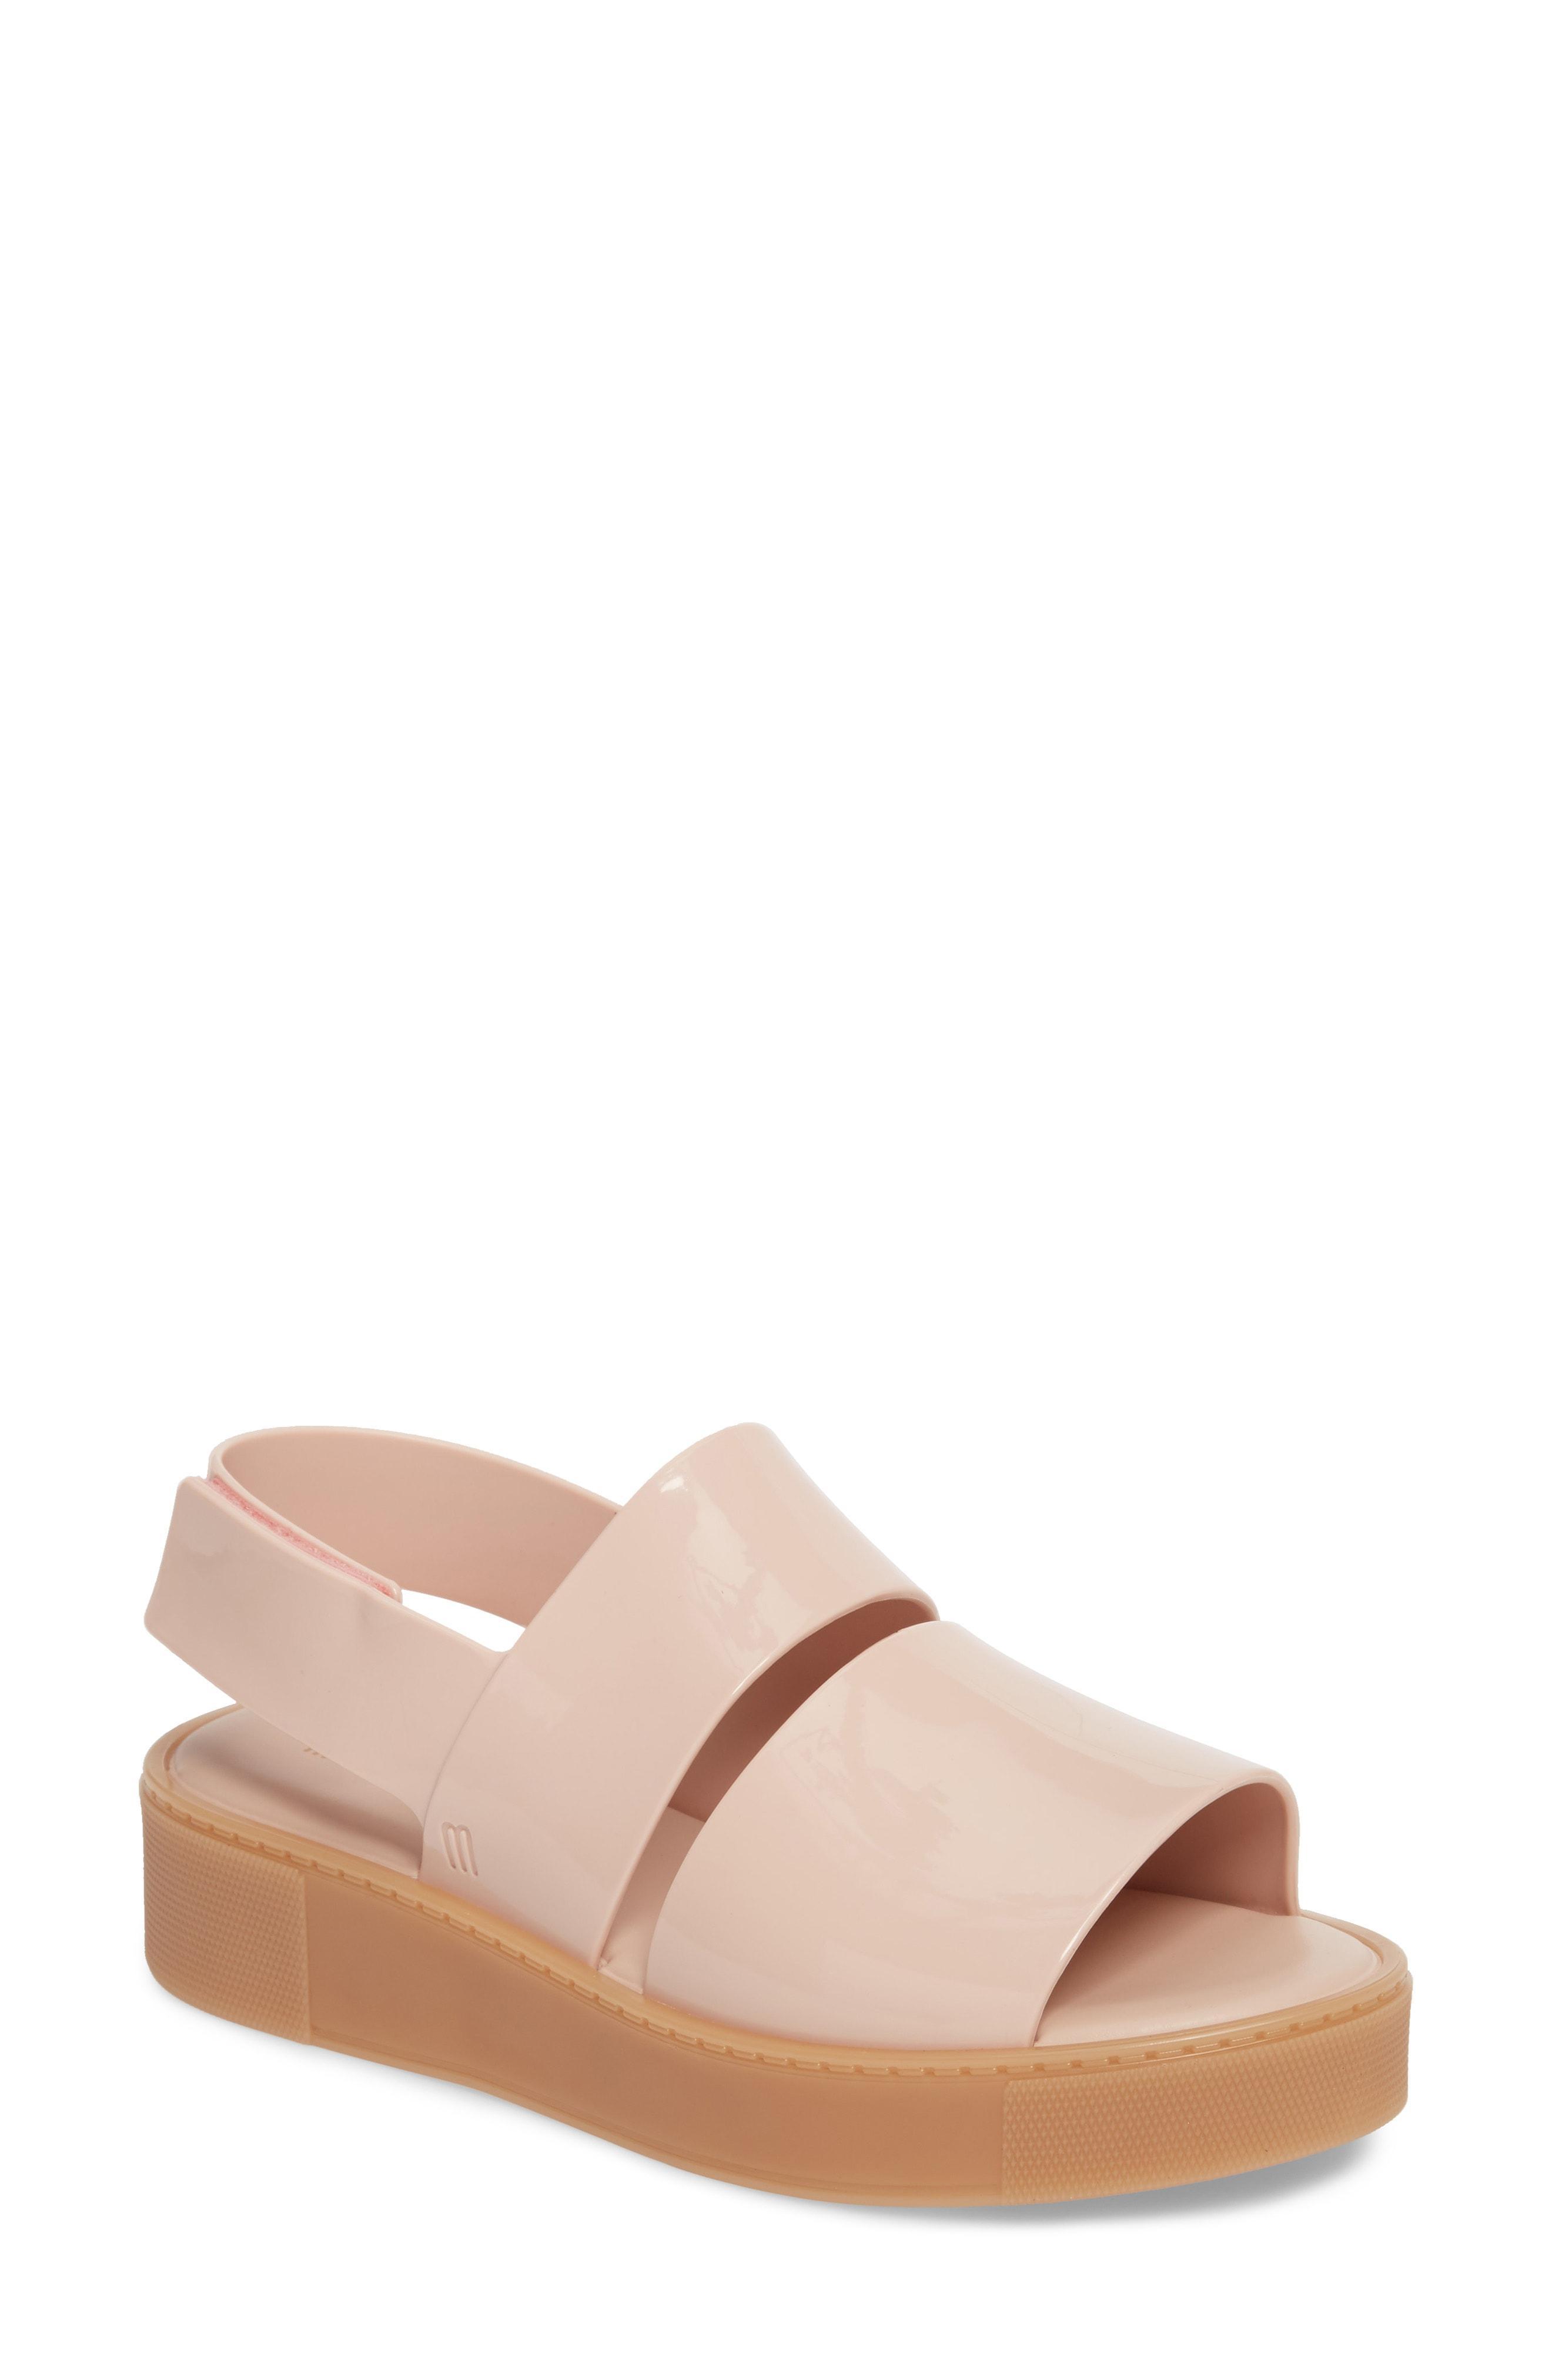 9ab24251042e Melissa Soho Chunky Slingback Sandals In Pink Beige